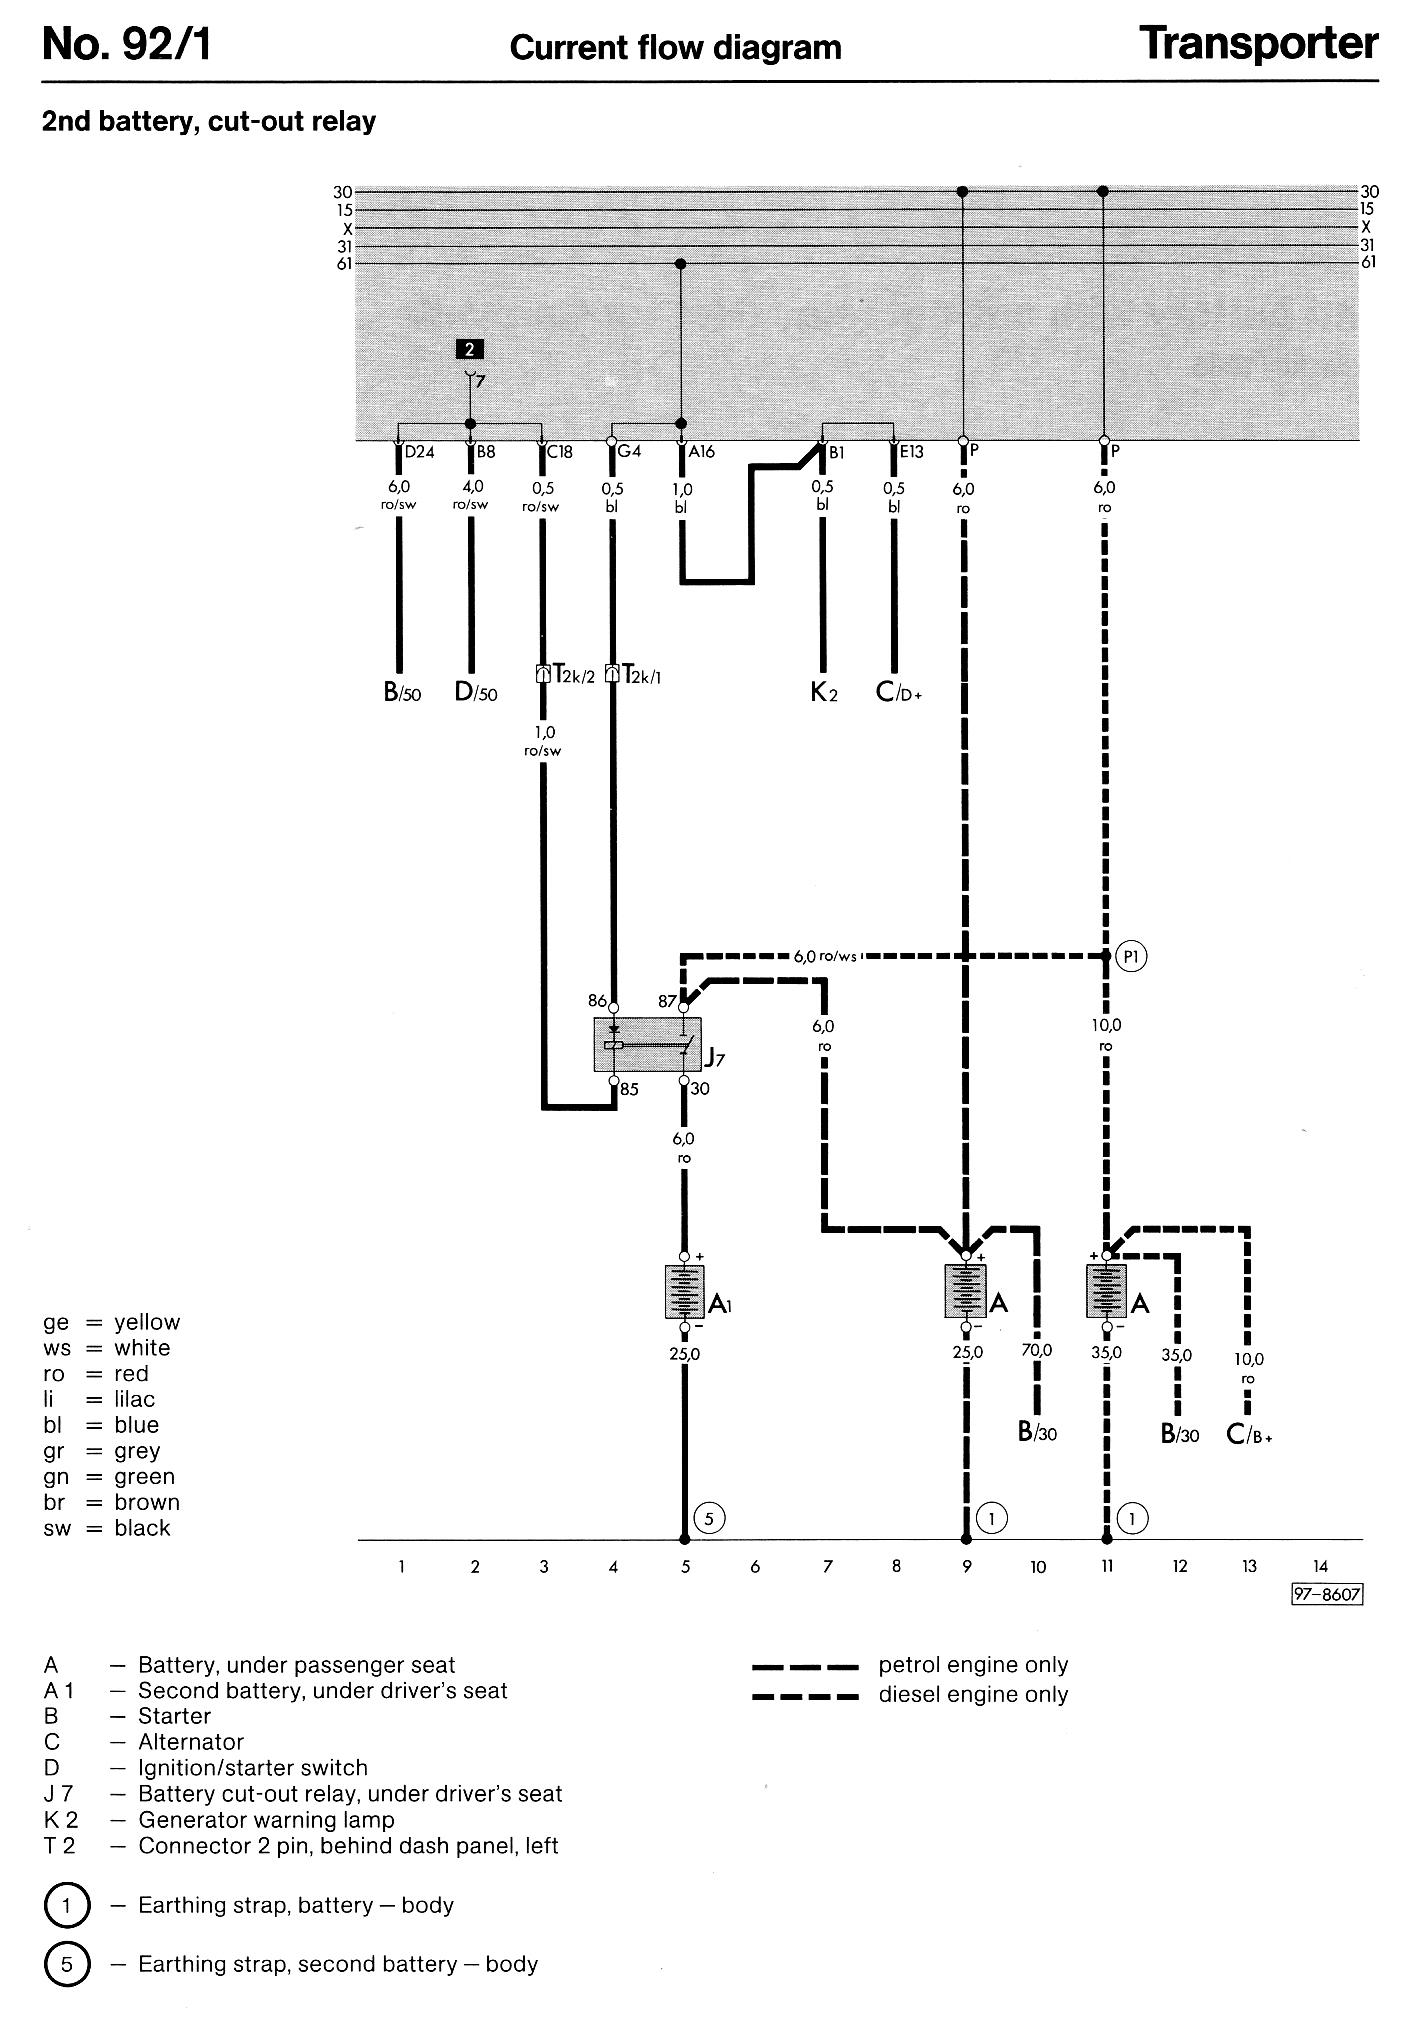 66 Vw Transporter Wiring Diagram   Best Wiring Library - Electric Heater Wiring Diagram